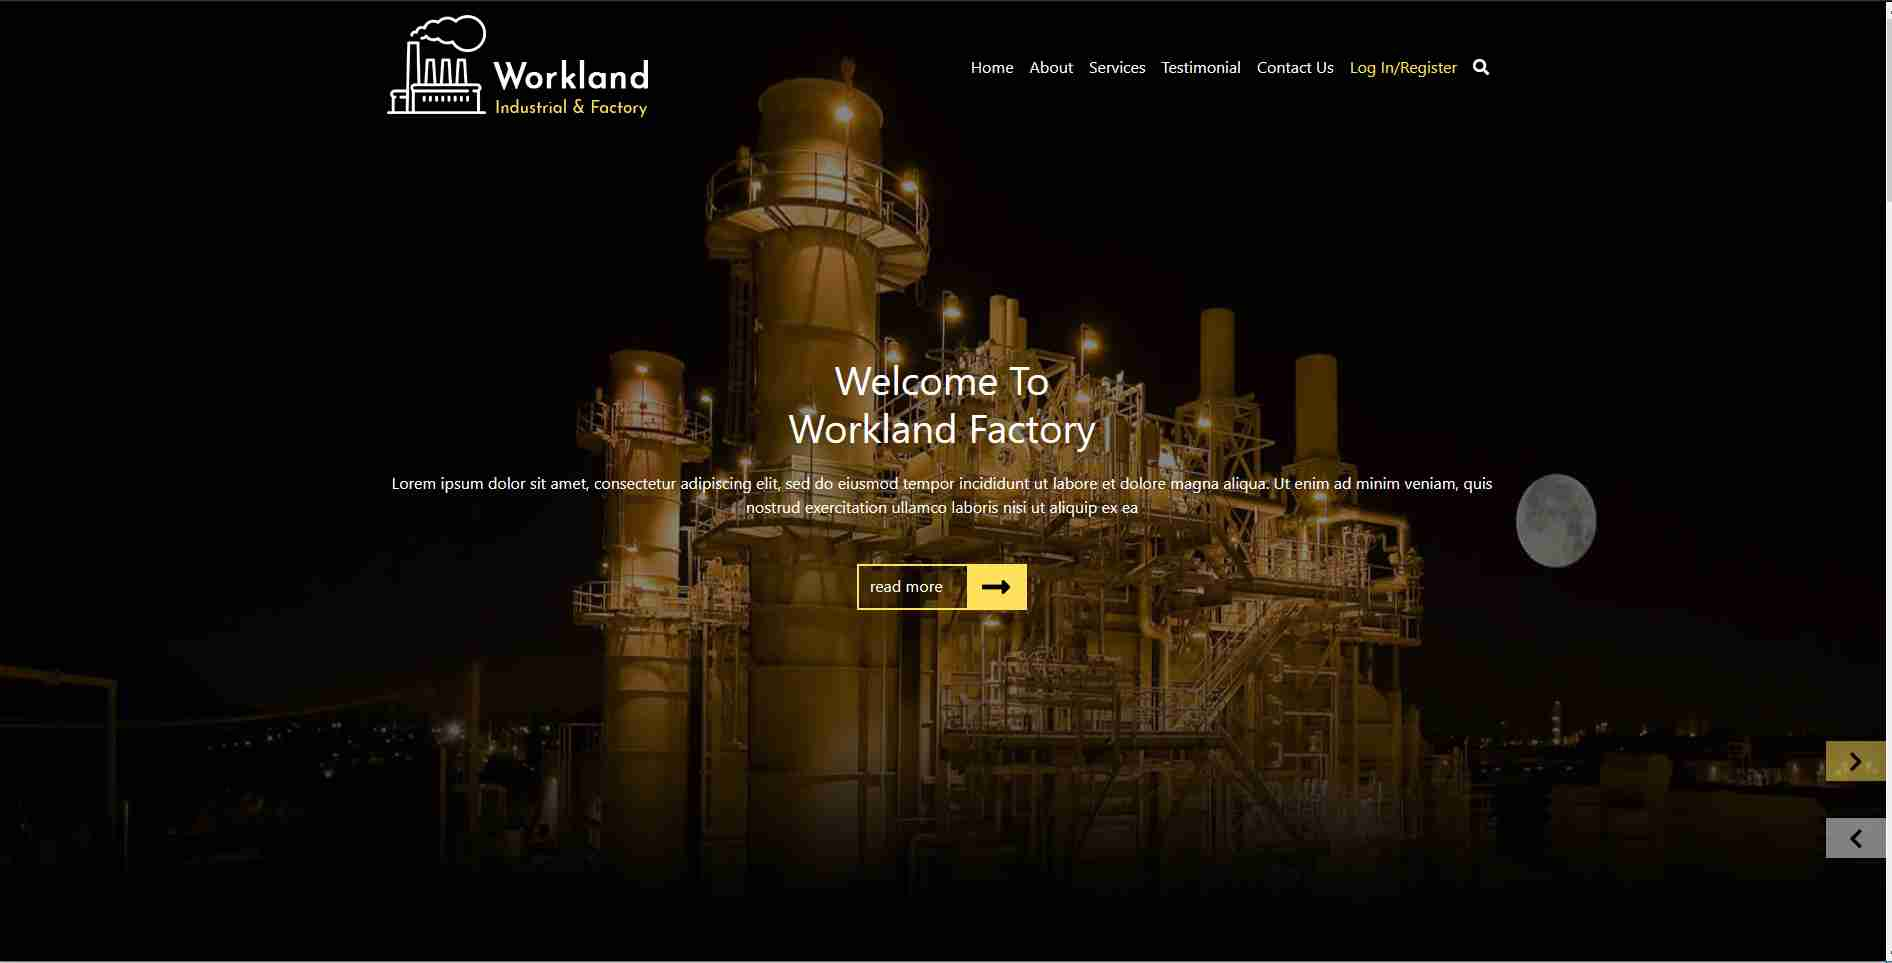 build responsive website using html5 css3